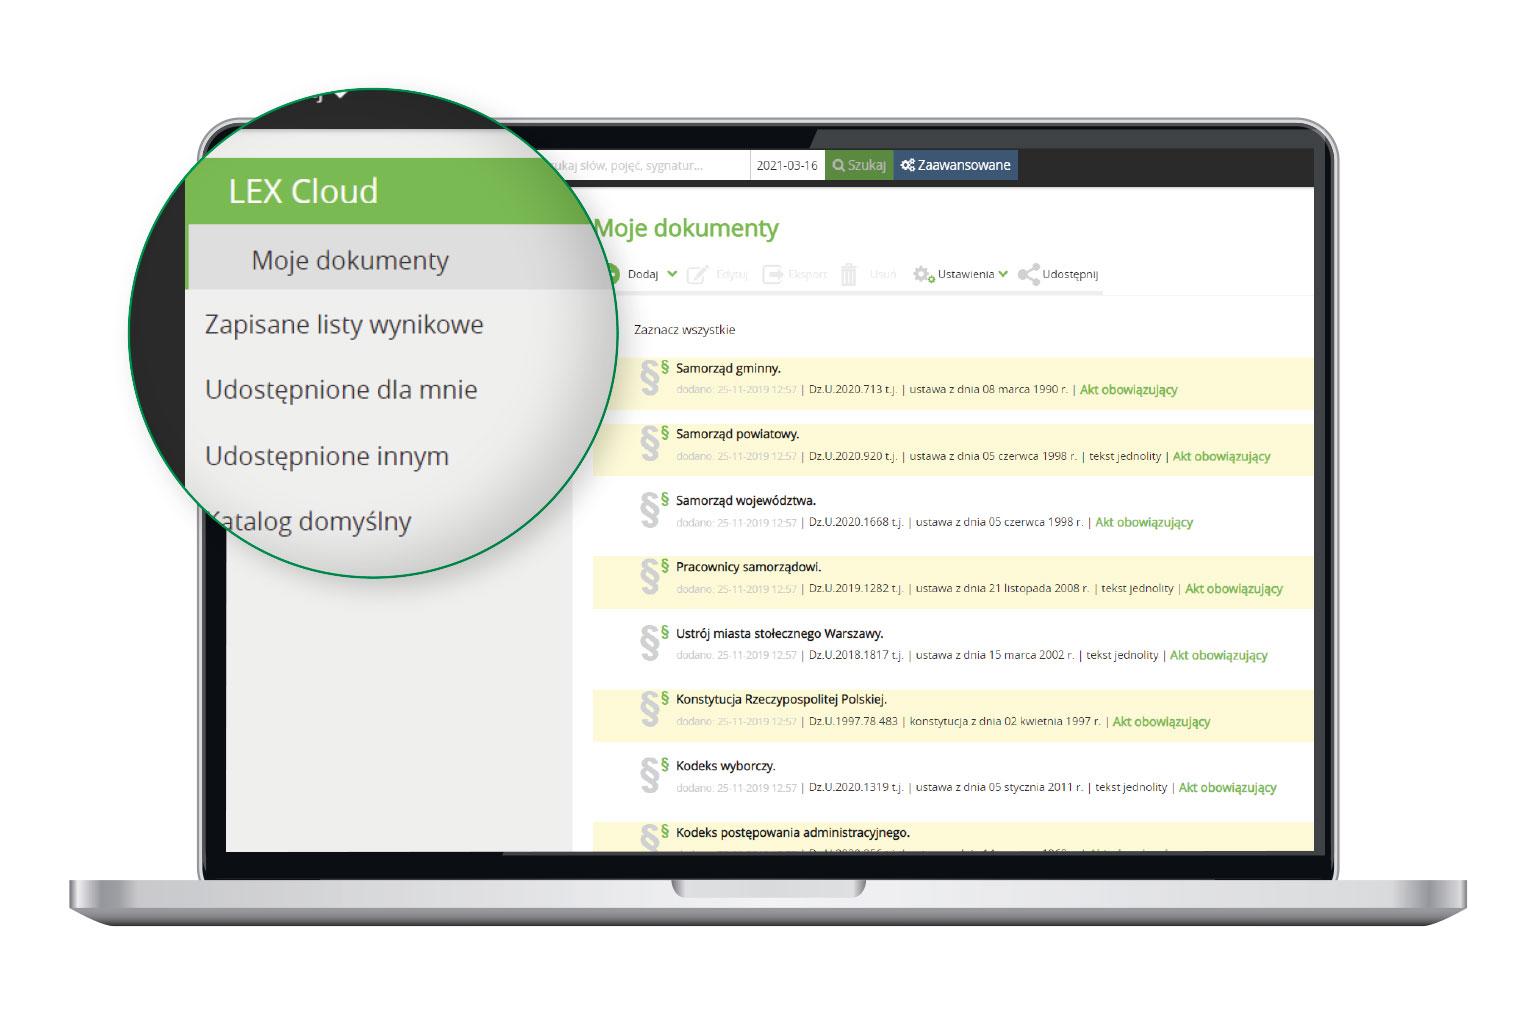 LEX Cloud w LEX Administracja